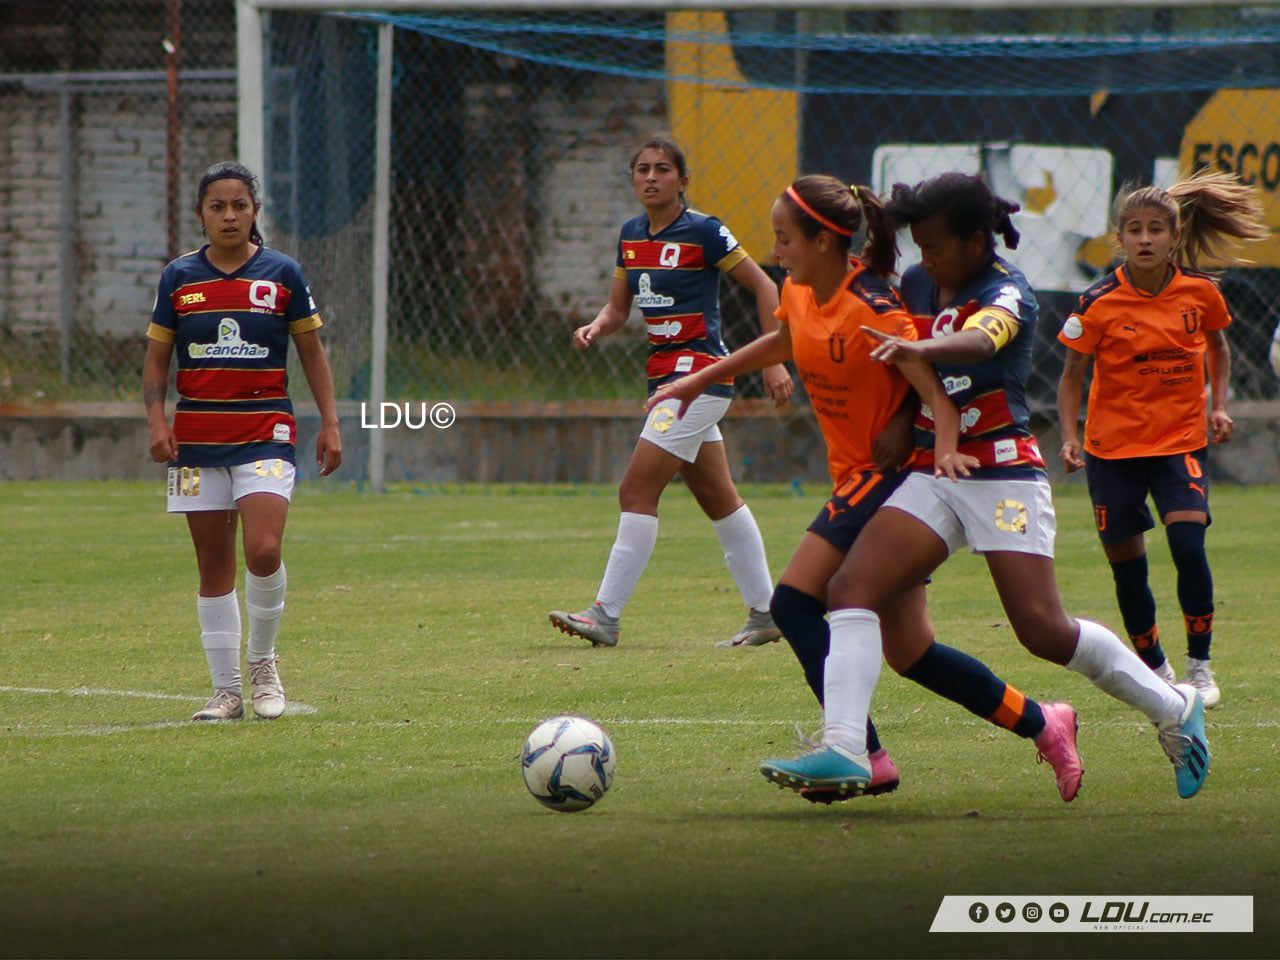 Quito FC 1-3 Guerreras Albas